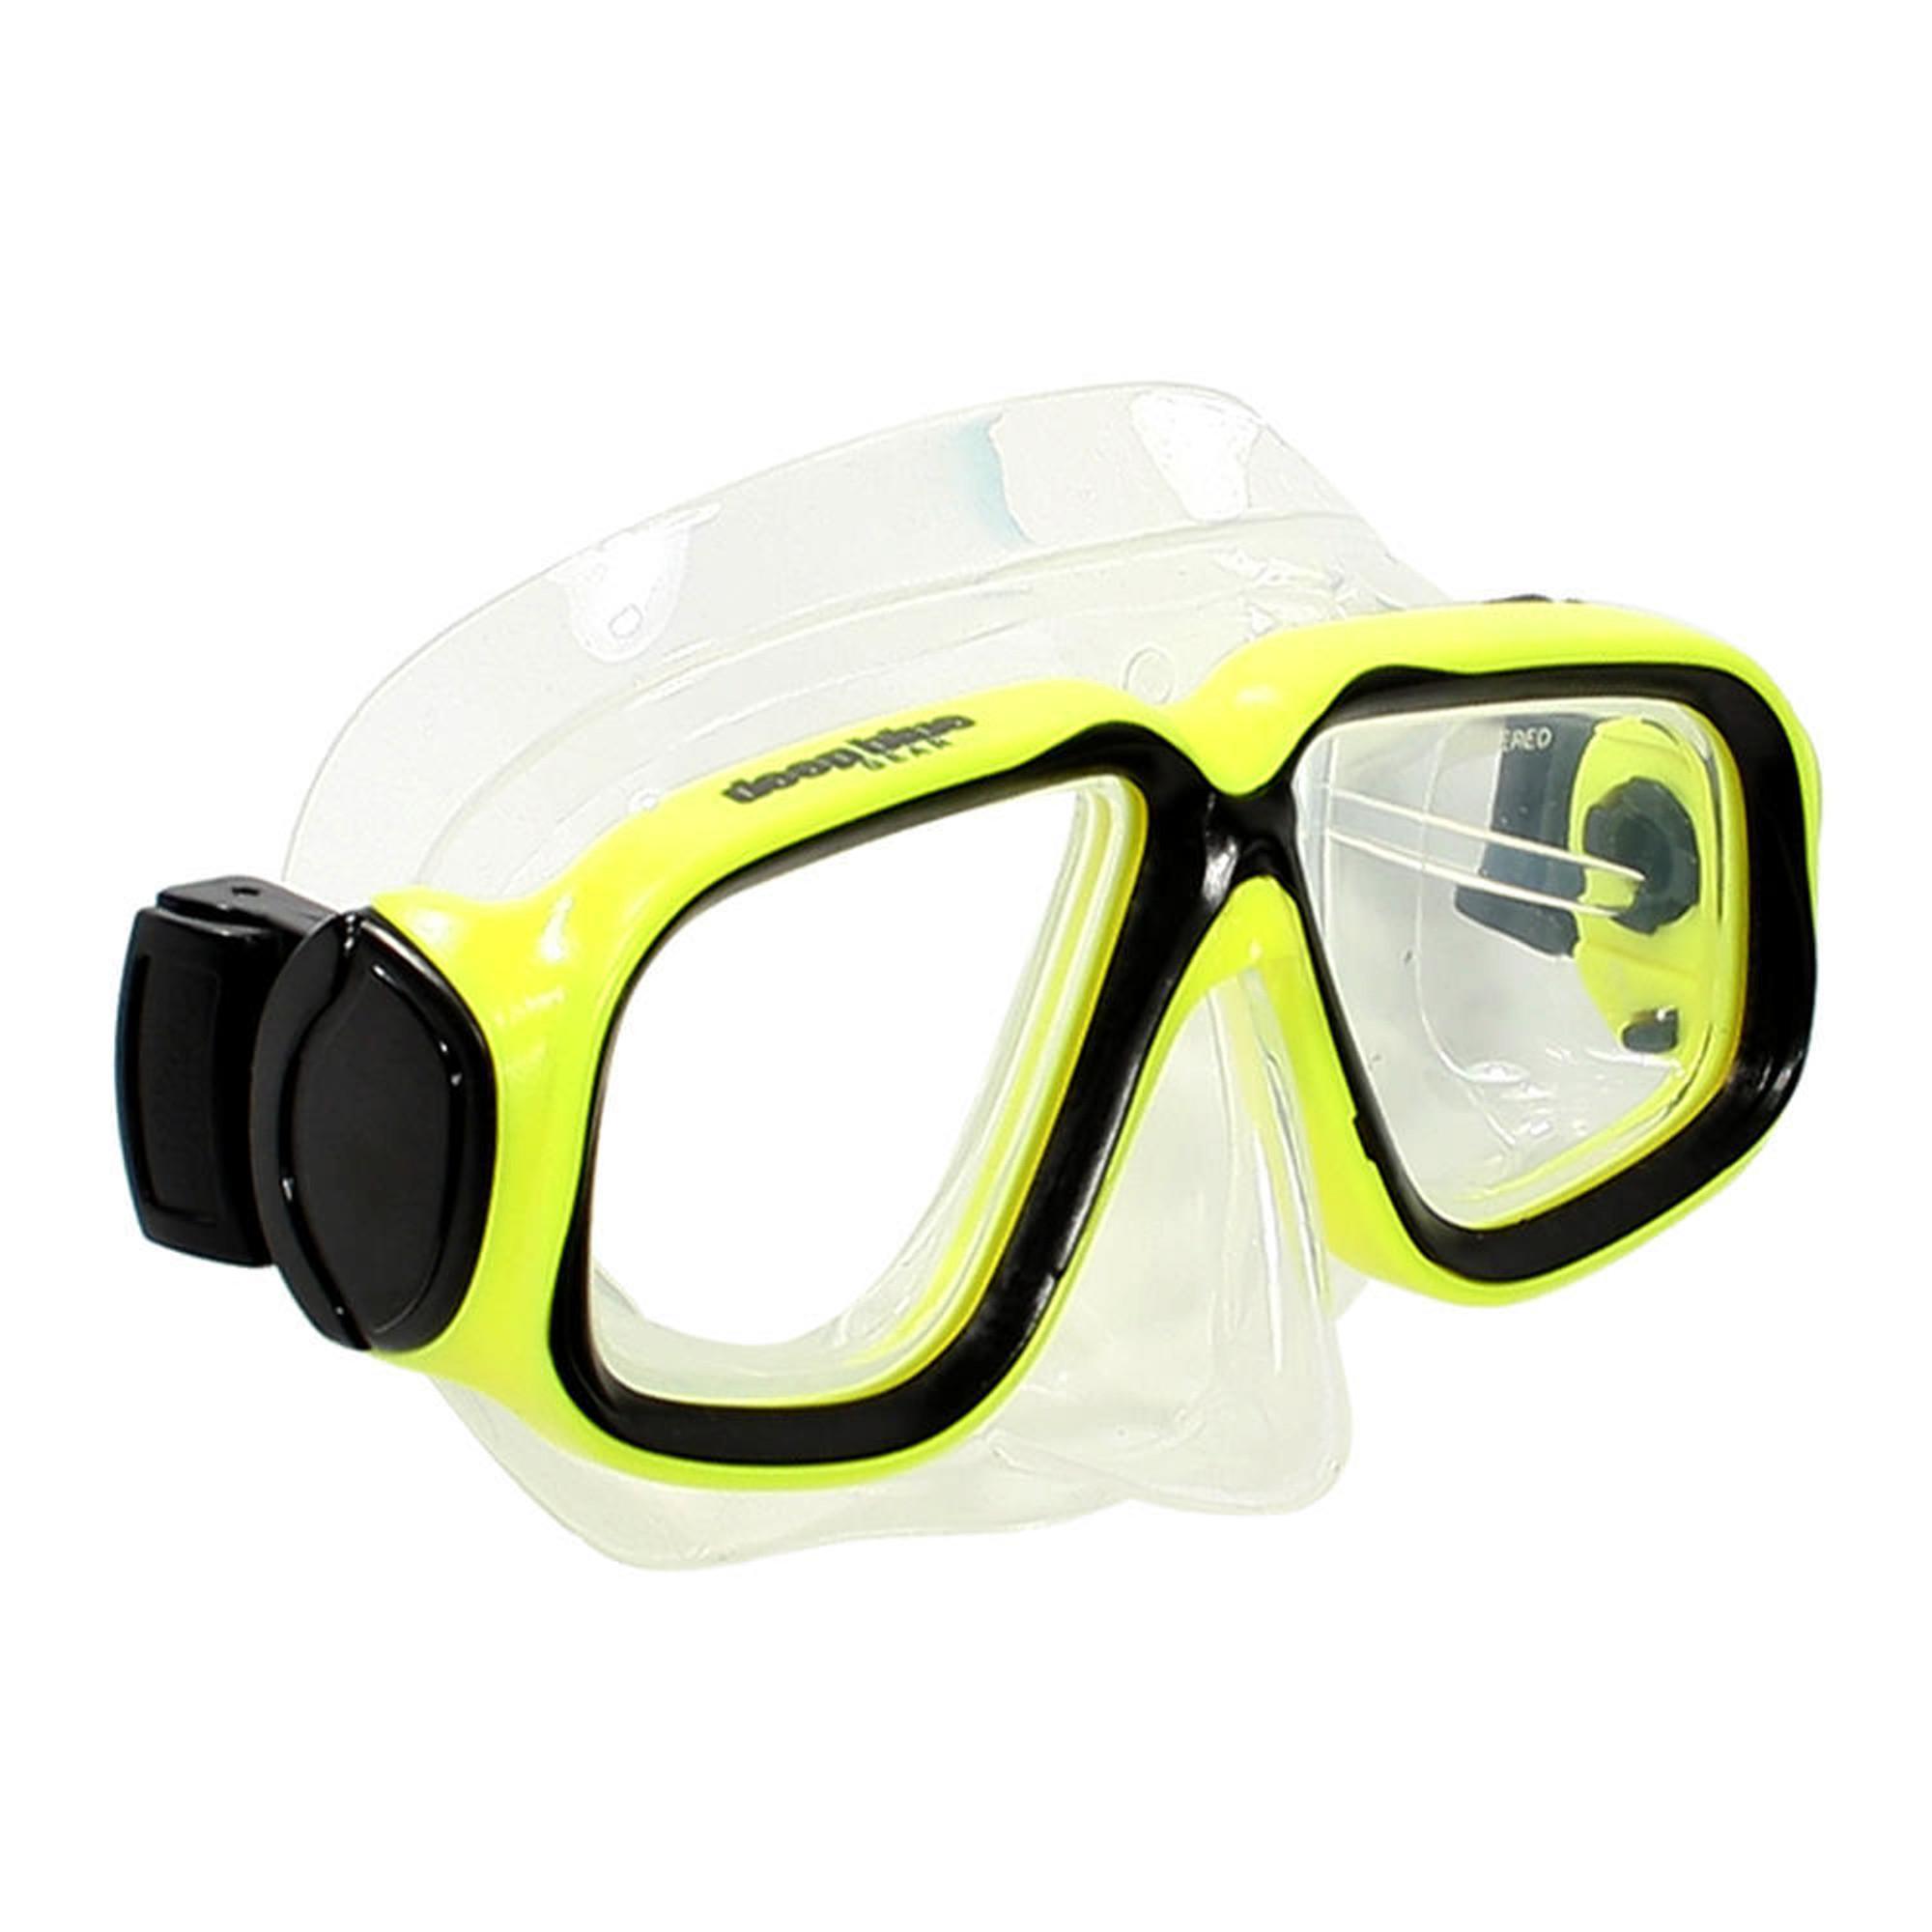 Maui Junior - Kid's Prescription Diving/Snorkeling Mask